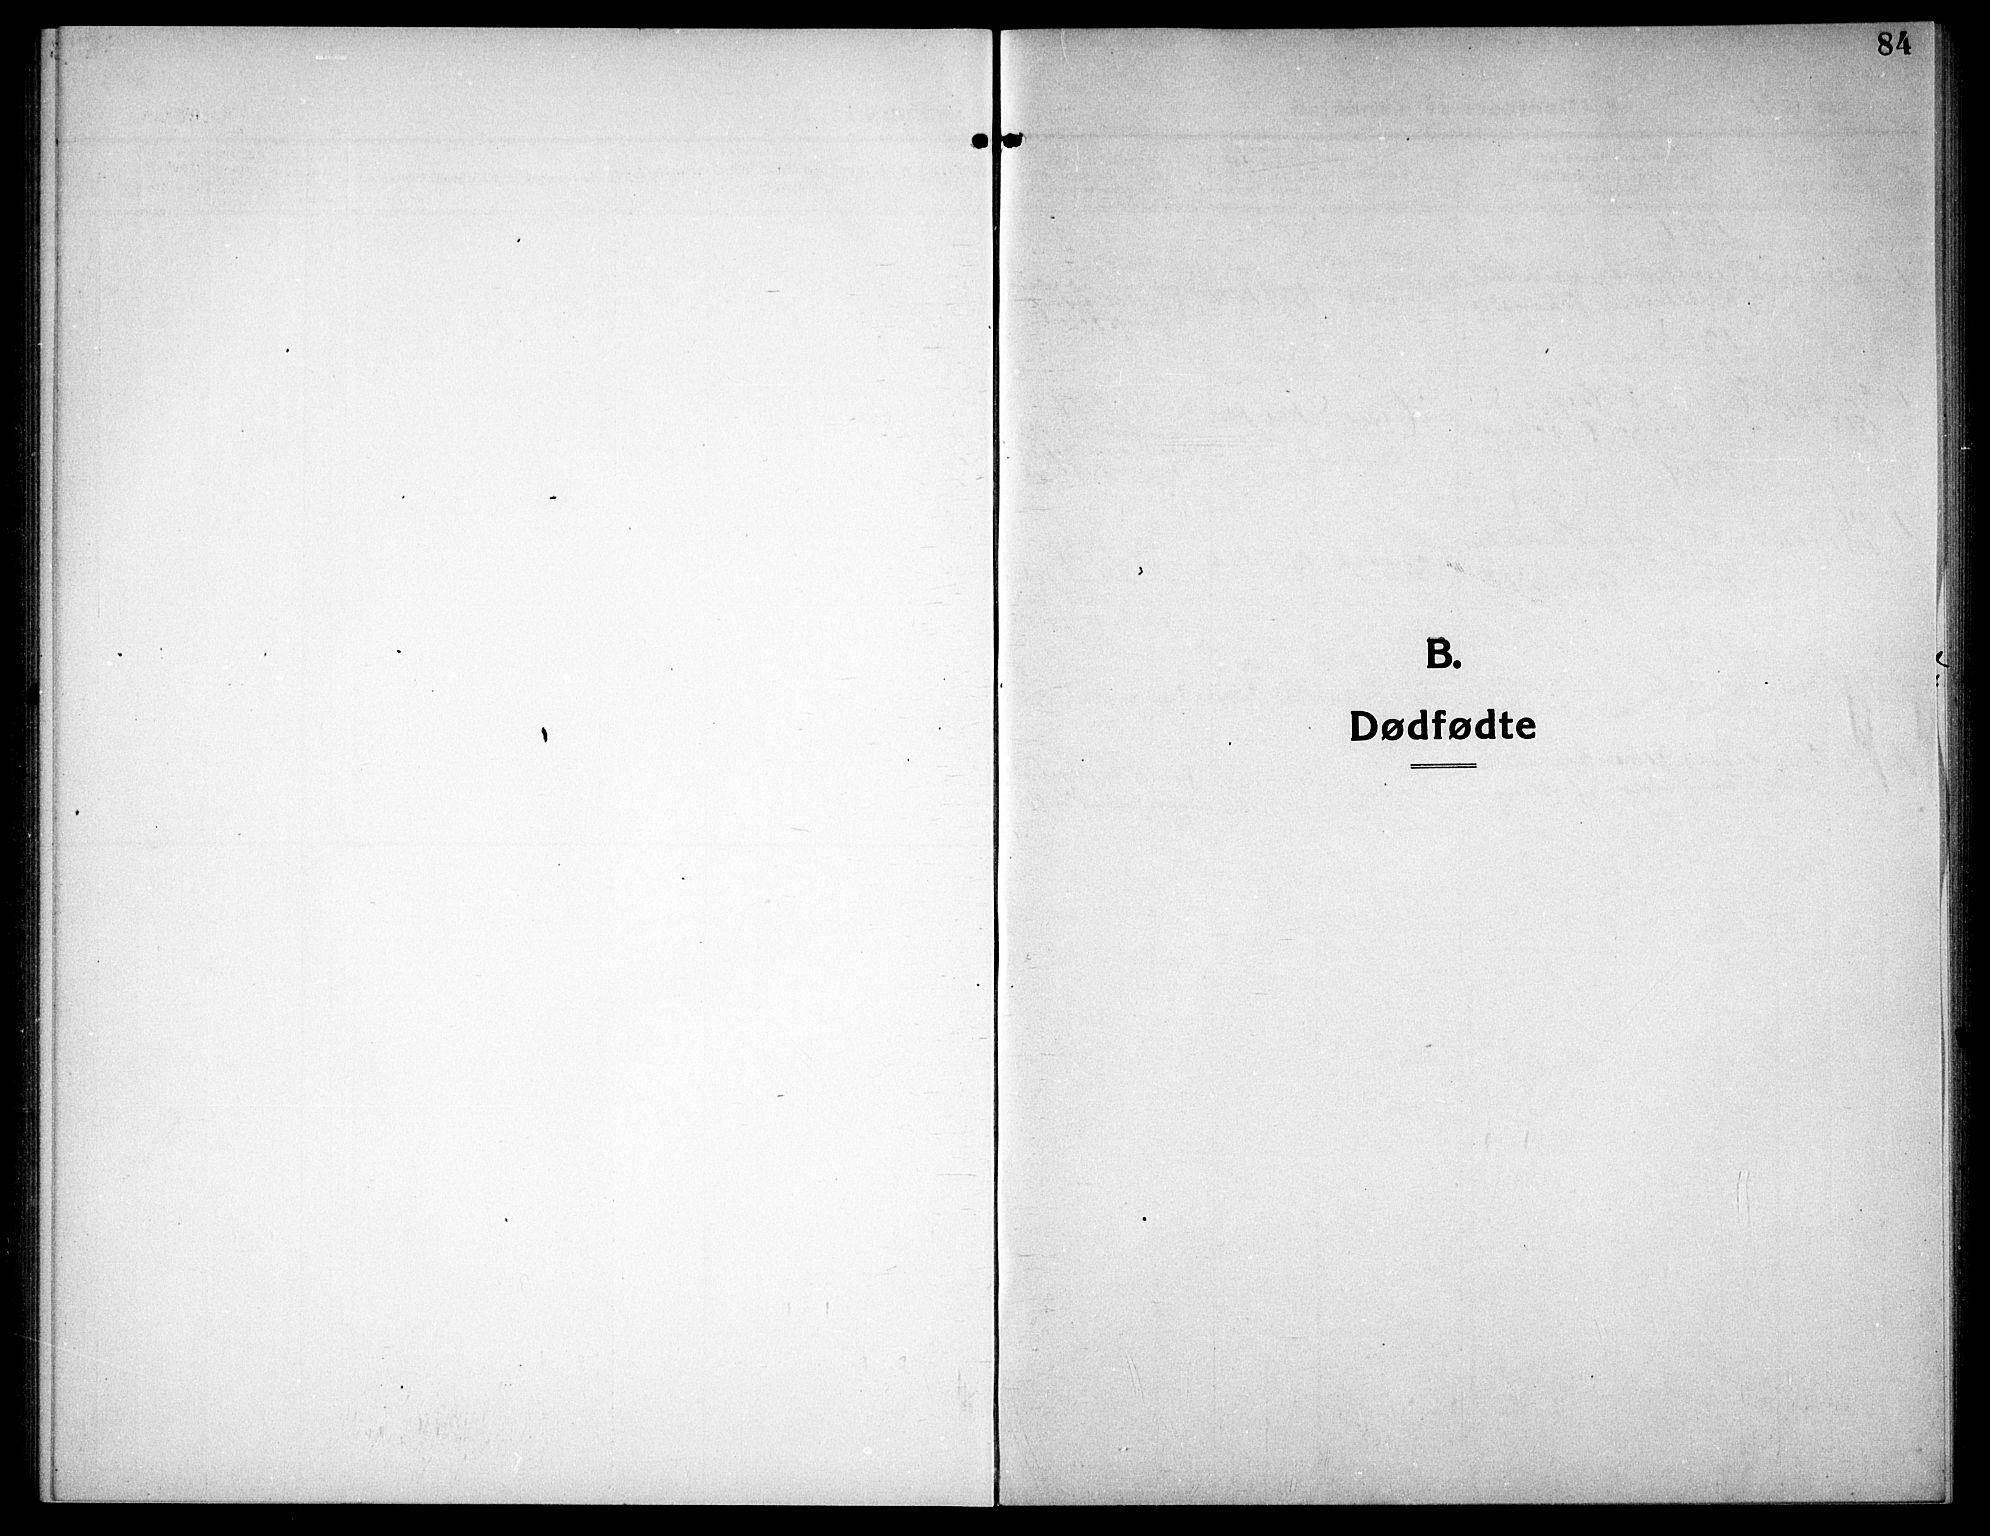 SAT, Ministerialprotokoller, klokkerbøker og fødselsregistre - Sør-Trøndelag, 656/L0696: Parish register (copy) no. 656C02, 1921-1937, p. 84